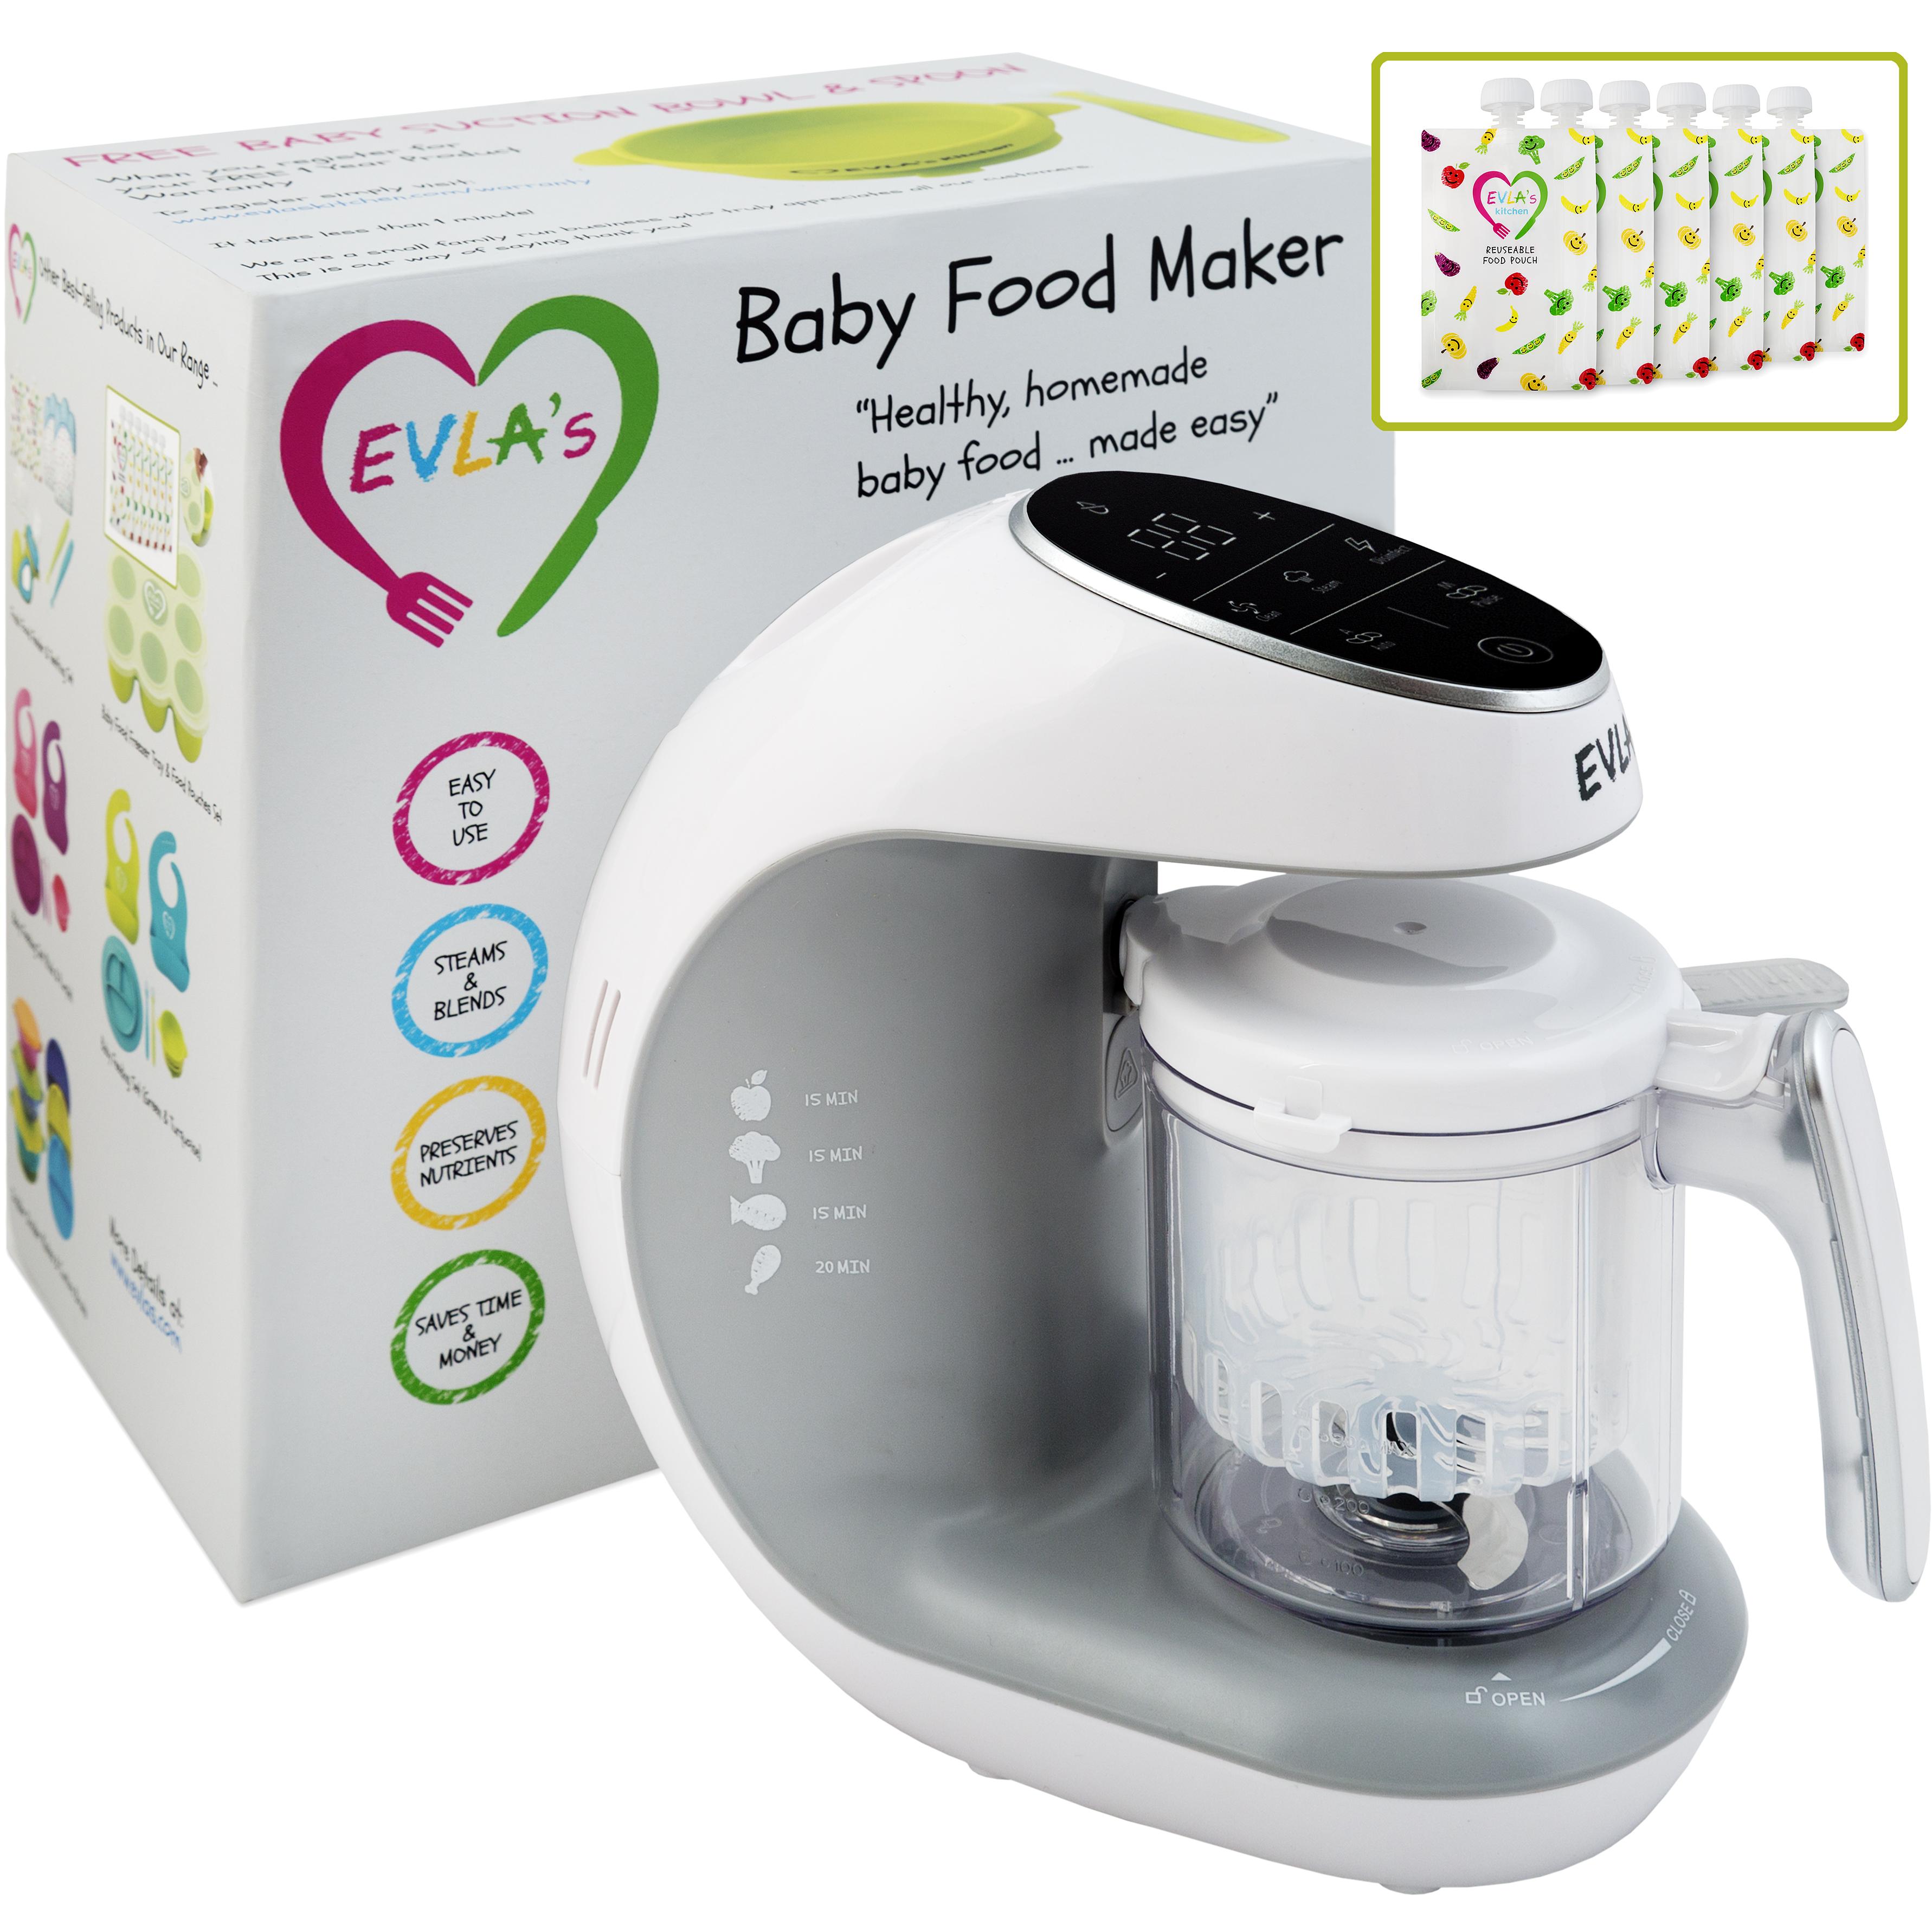 EVLA's Kitchen Baby Food Maker